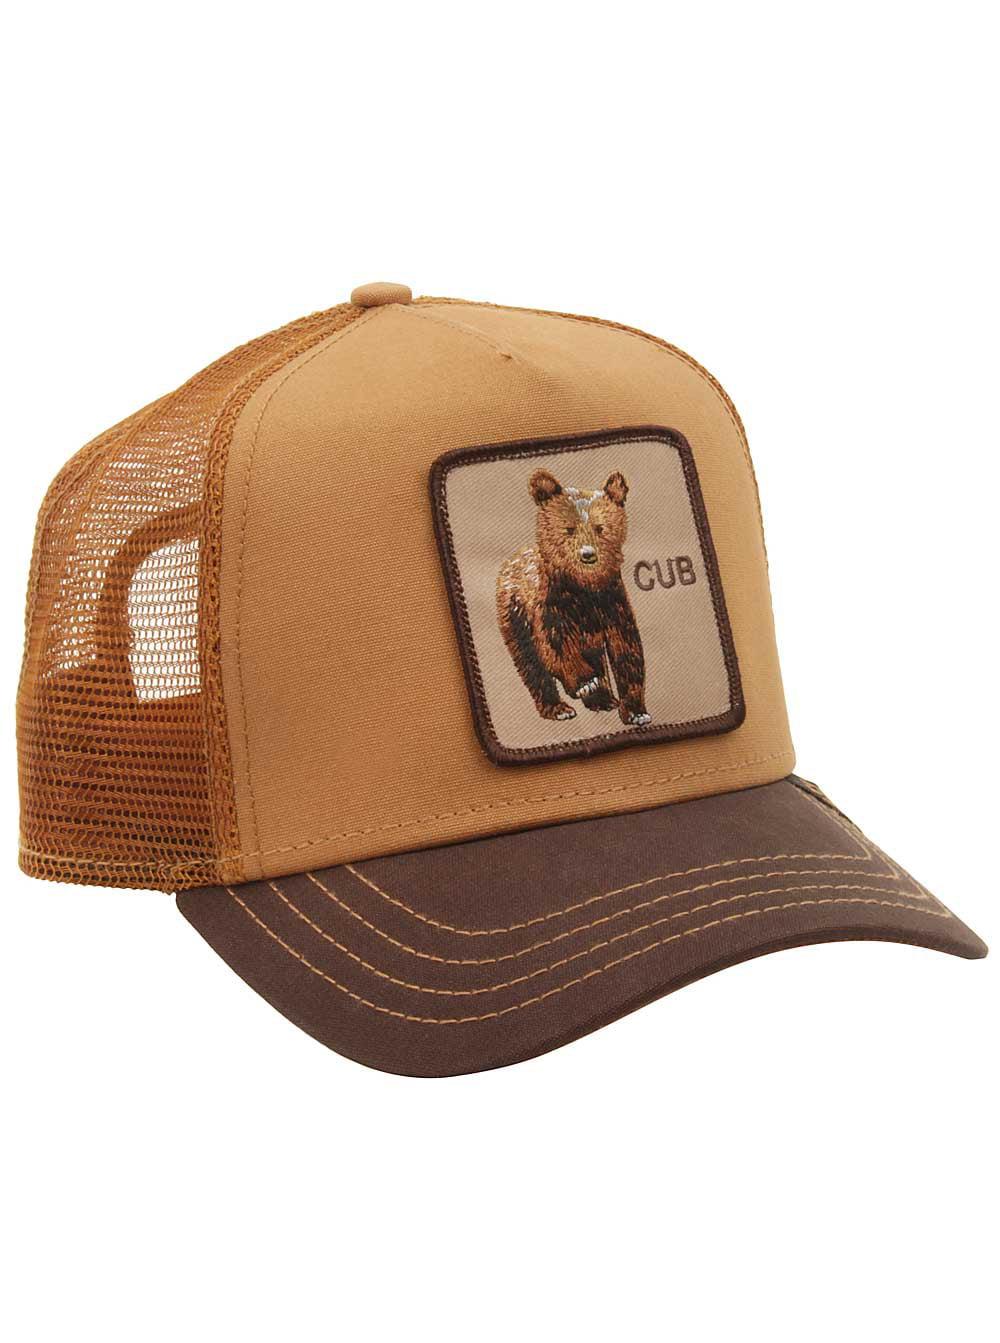 052821868a6 Goorin Bros. - Goorin Bros. Mens Cub Hat in Brown - Walmart.com